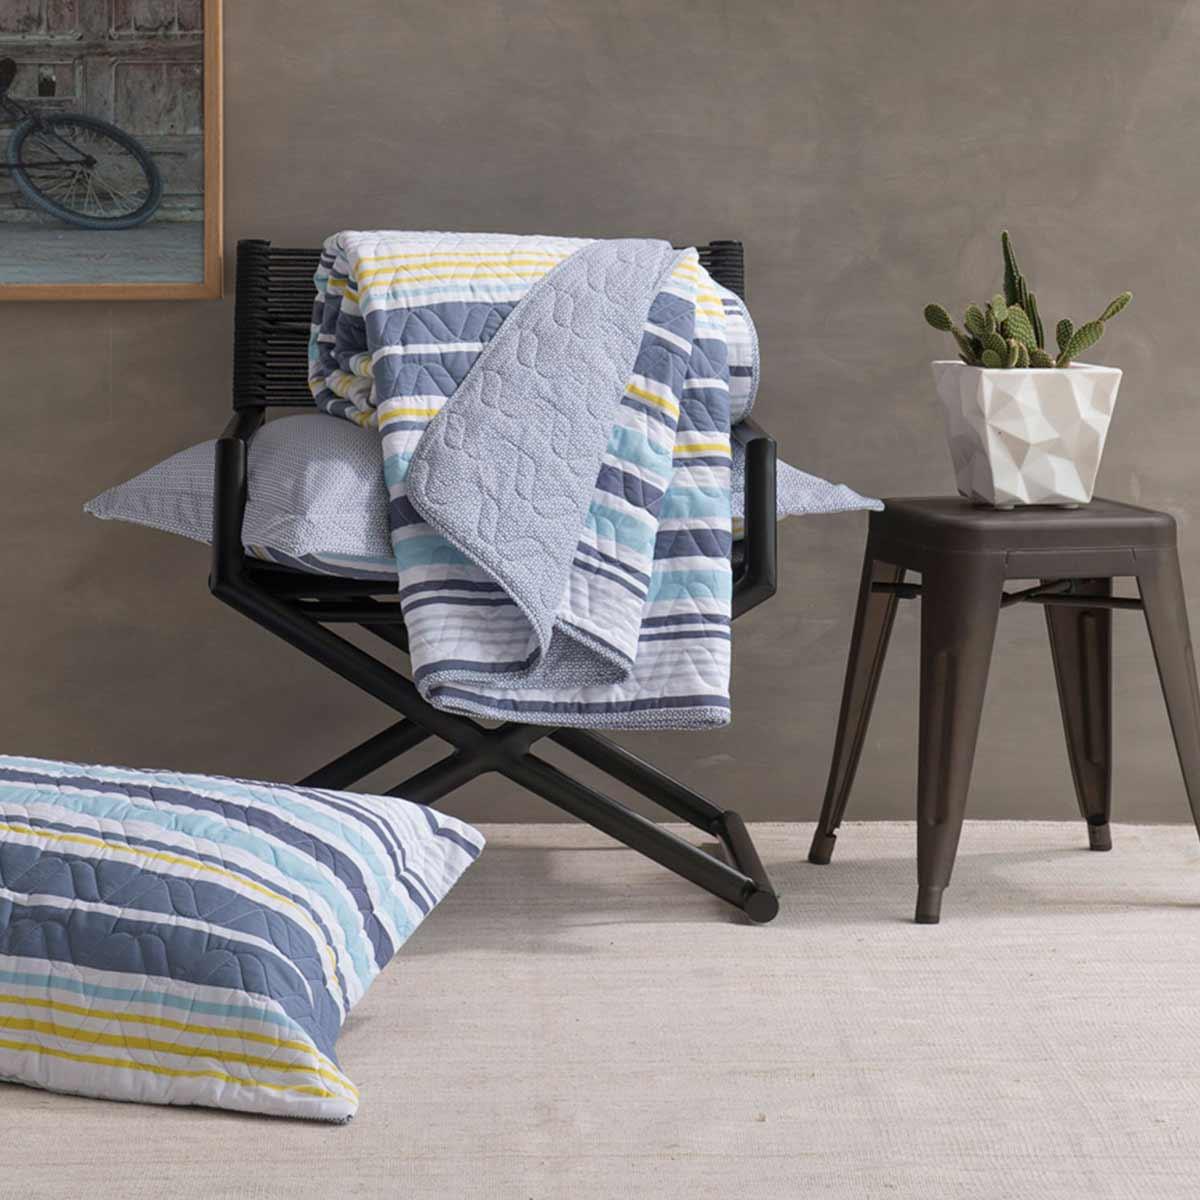 Kit Colcha Queen Size Home Design 100% Algodão Oliver Cinza Santista